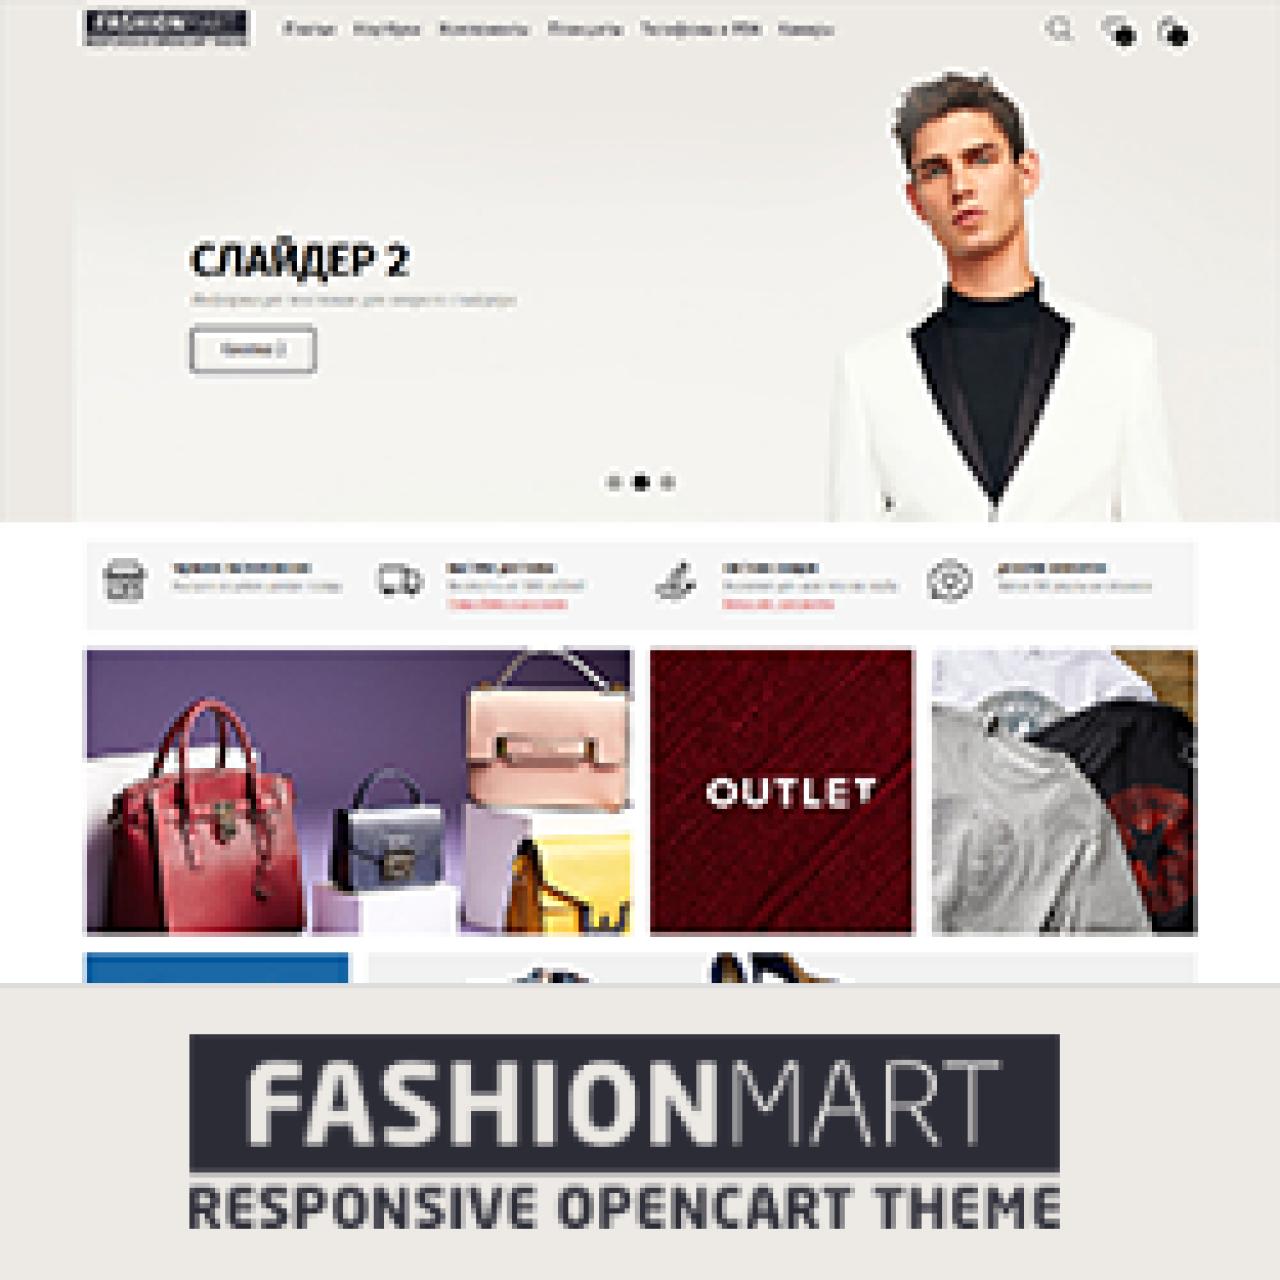 20f6e99b9f9 FASHIONMART - адаптивный шаблон интернет магазина одежды